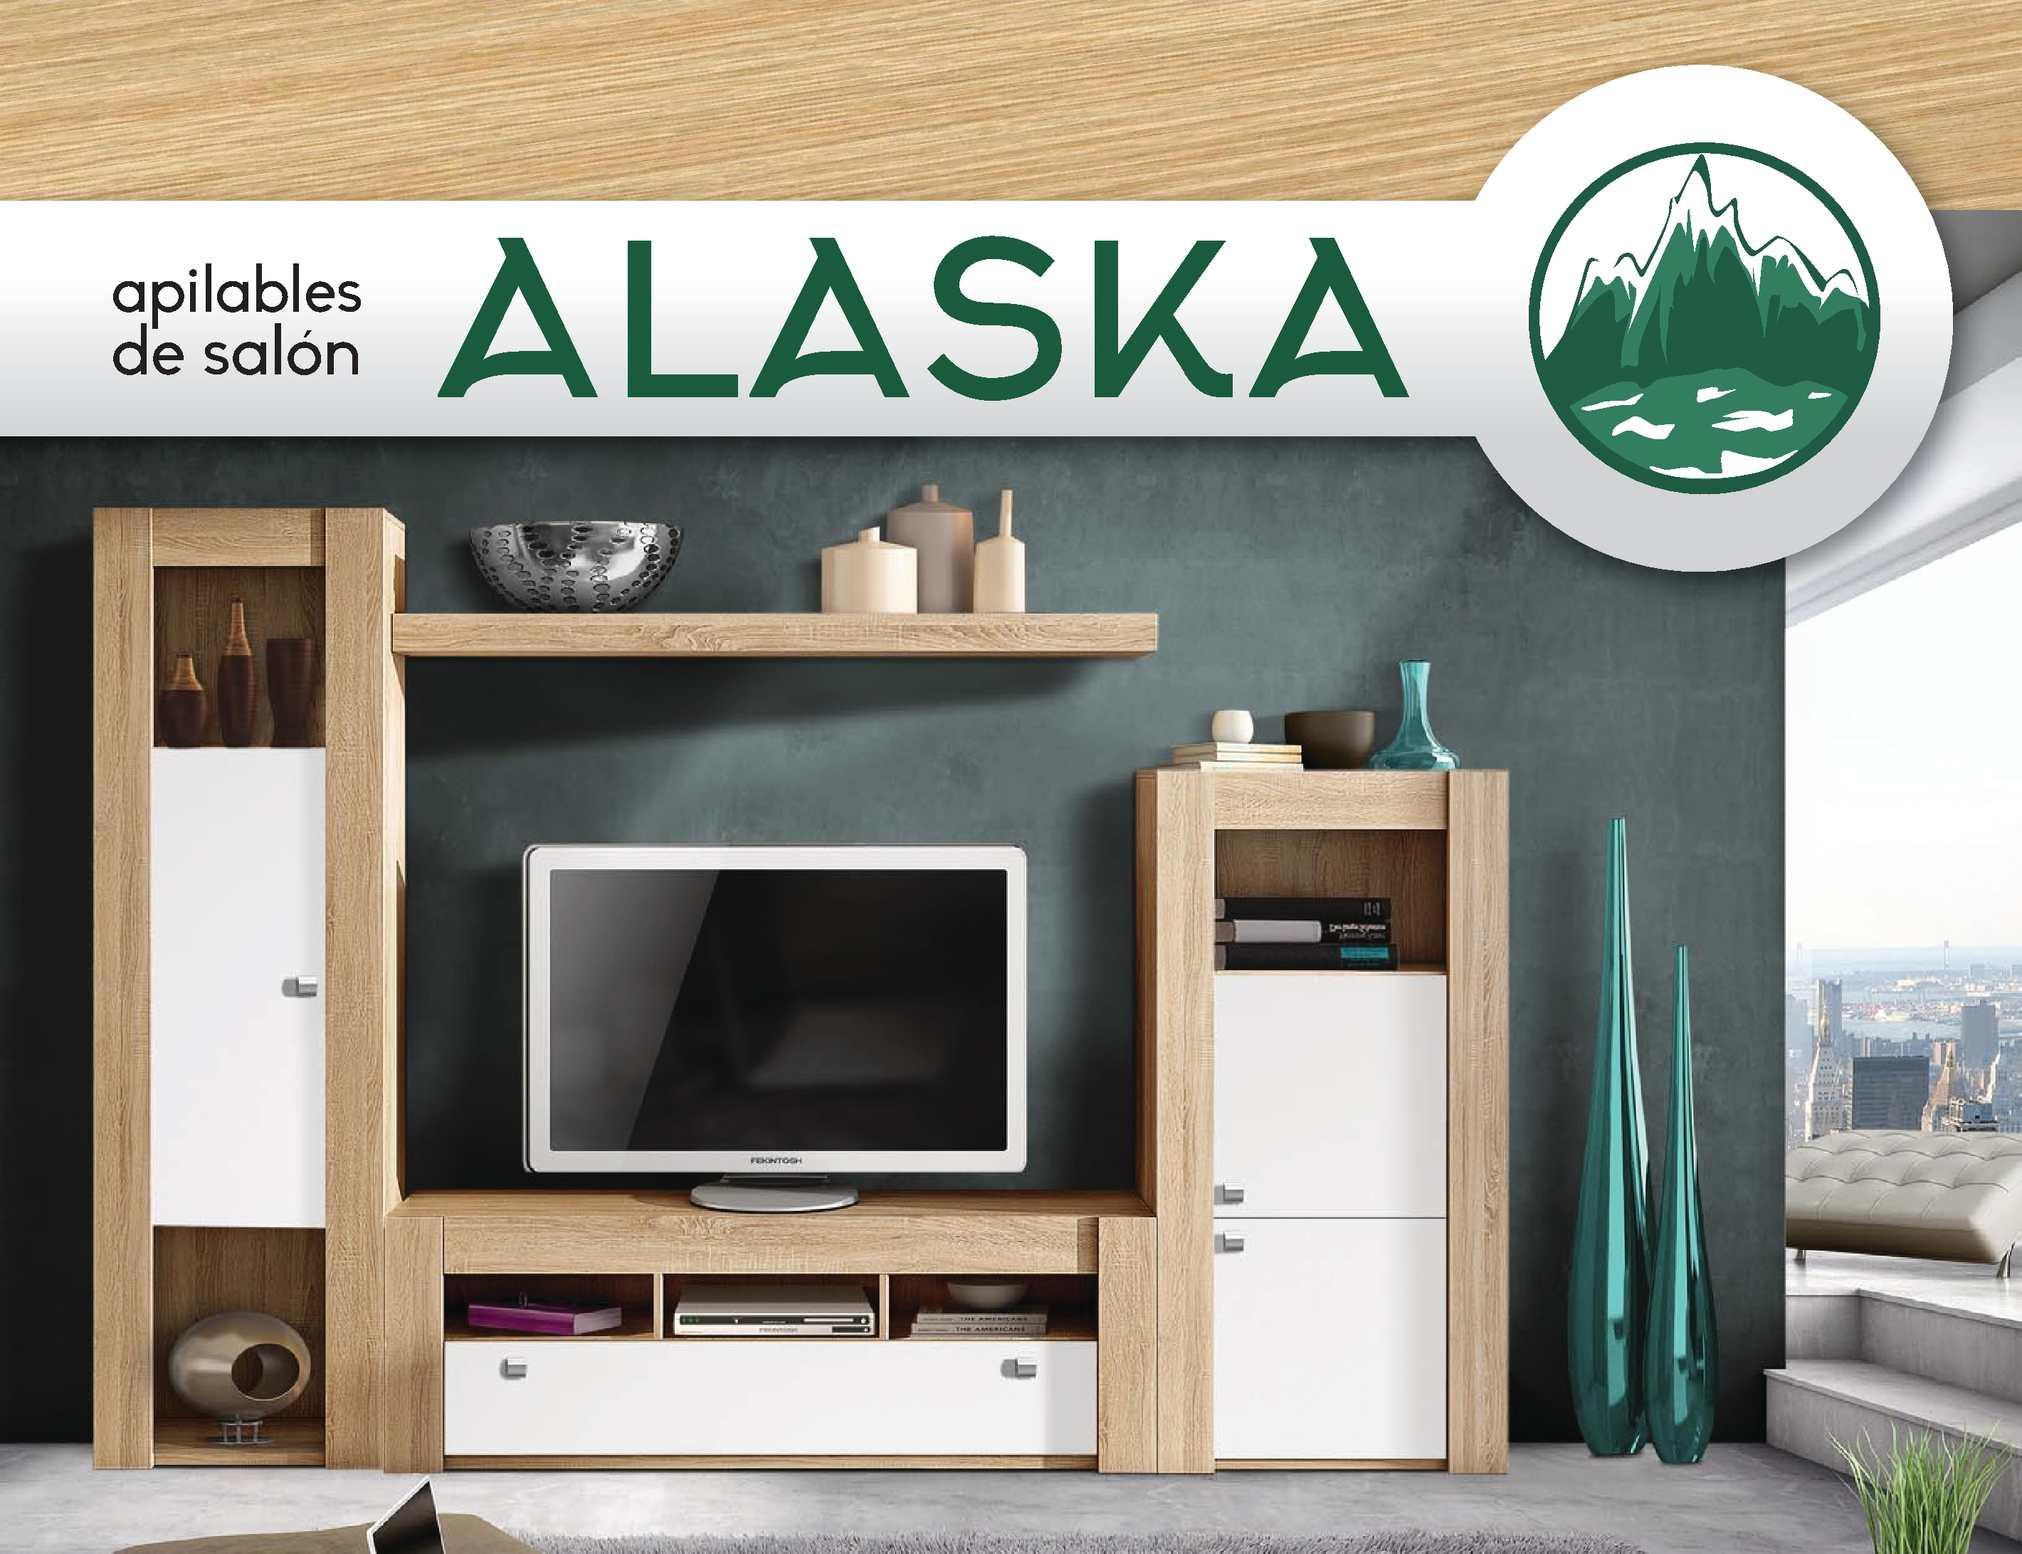 Calameo Muebles San Francisco Madrid Catalogo De Salones Alaska